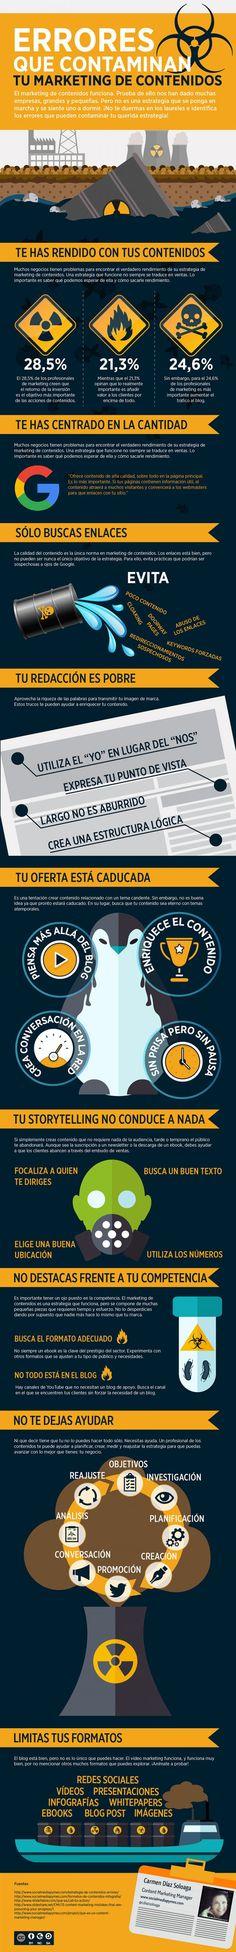 Errores que contaminan tu Marketing de Contenidos #infografia #infographic #marketing